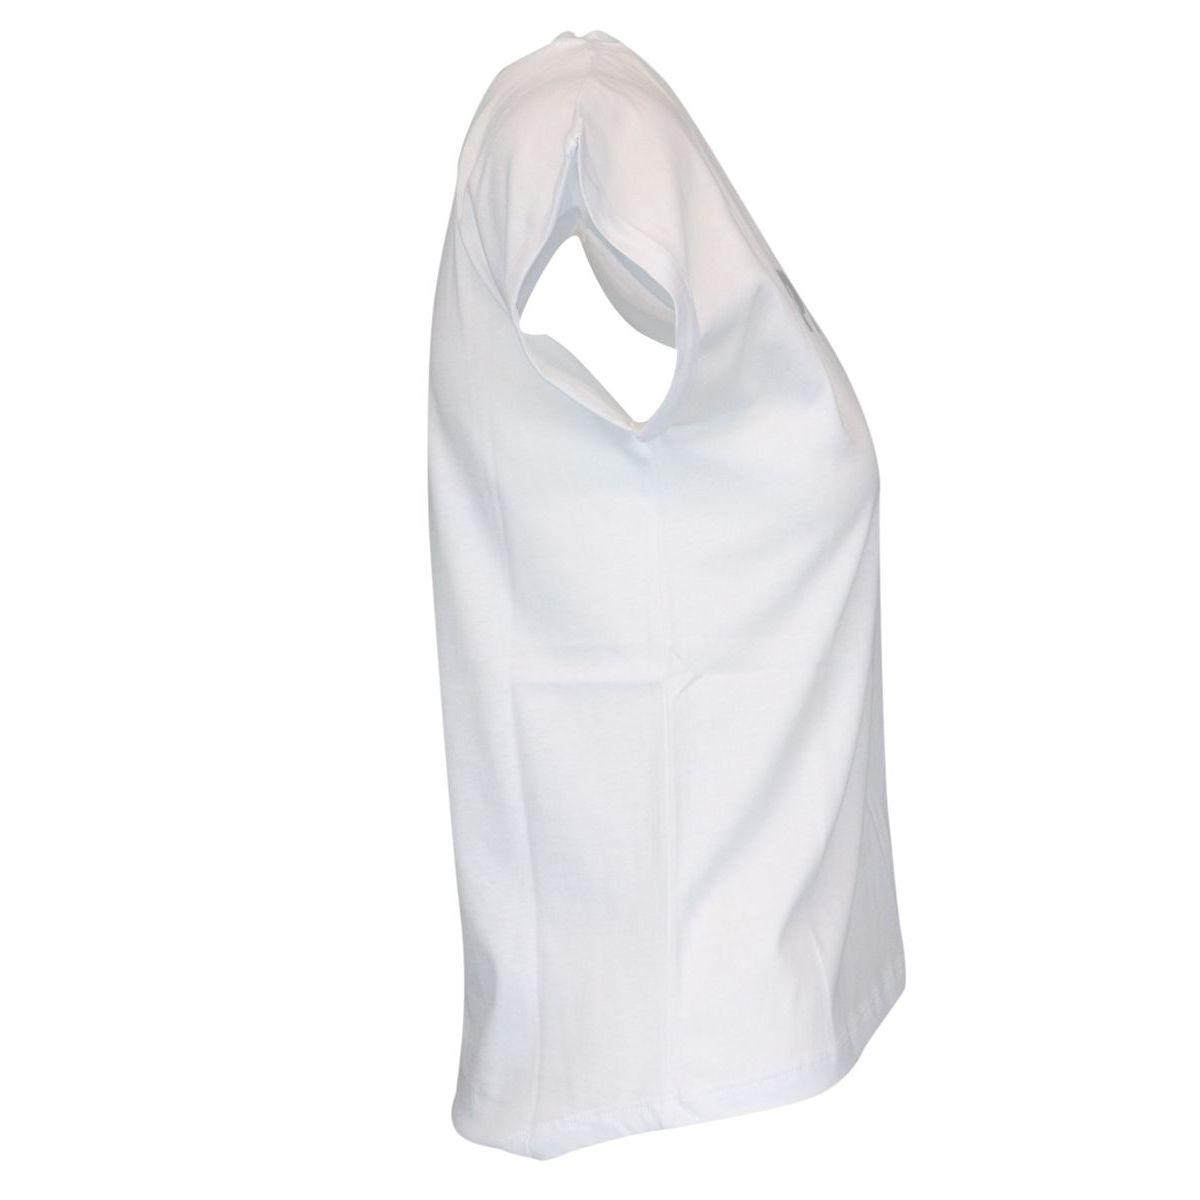 Cotton t-shirt with laminated logo print White / silver Patrizia Pepe